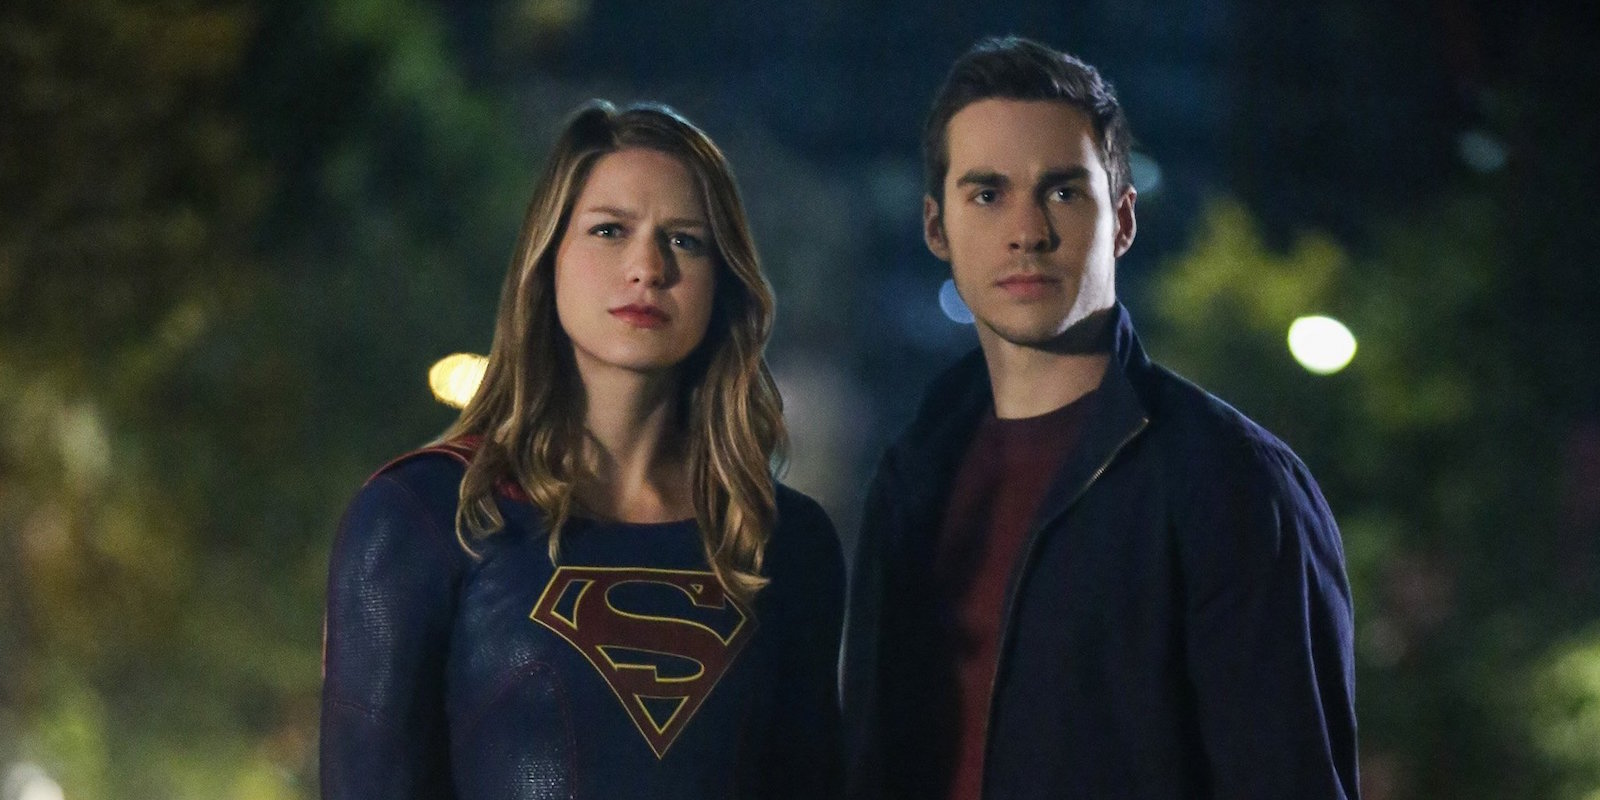 Image result for supergirl season 3